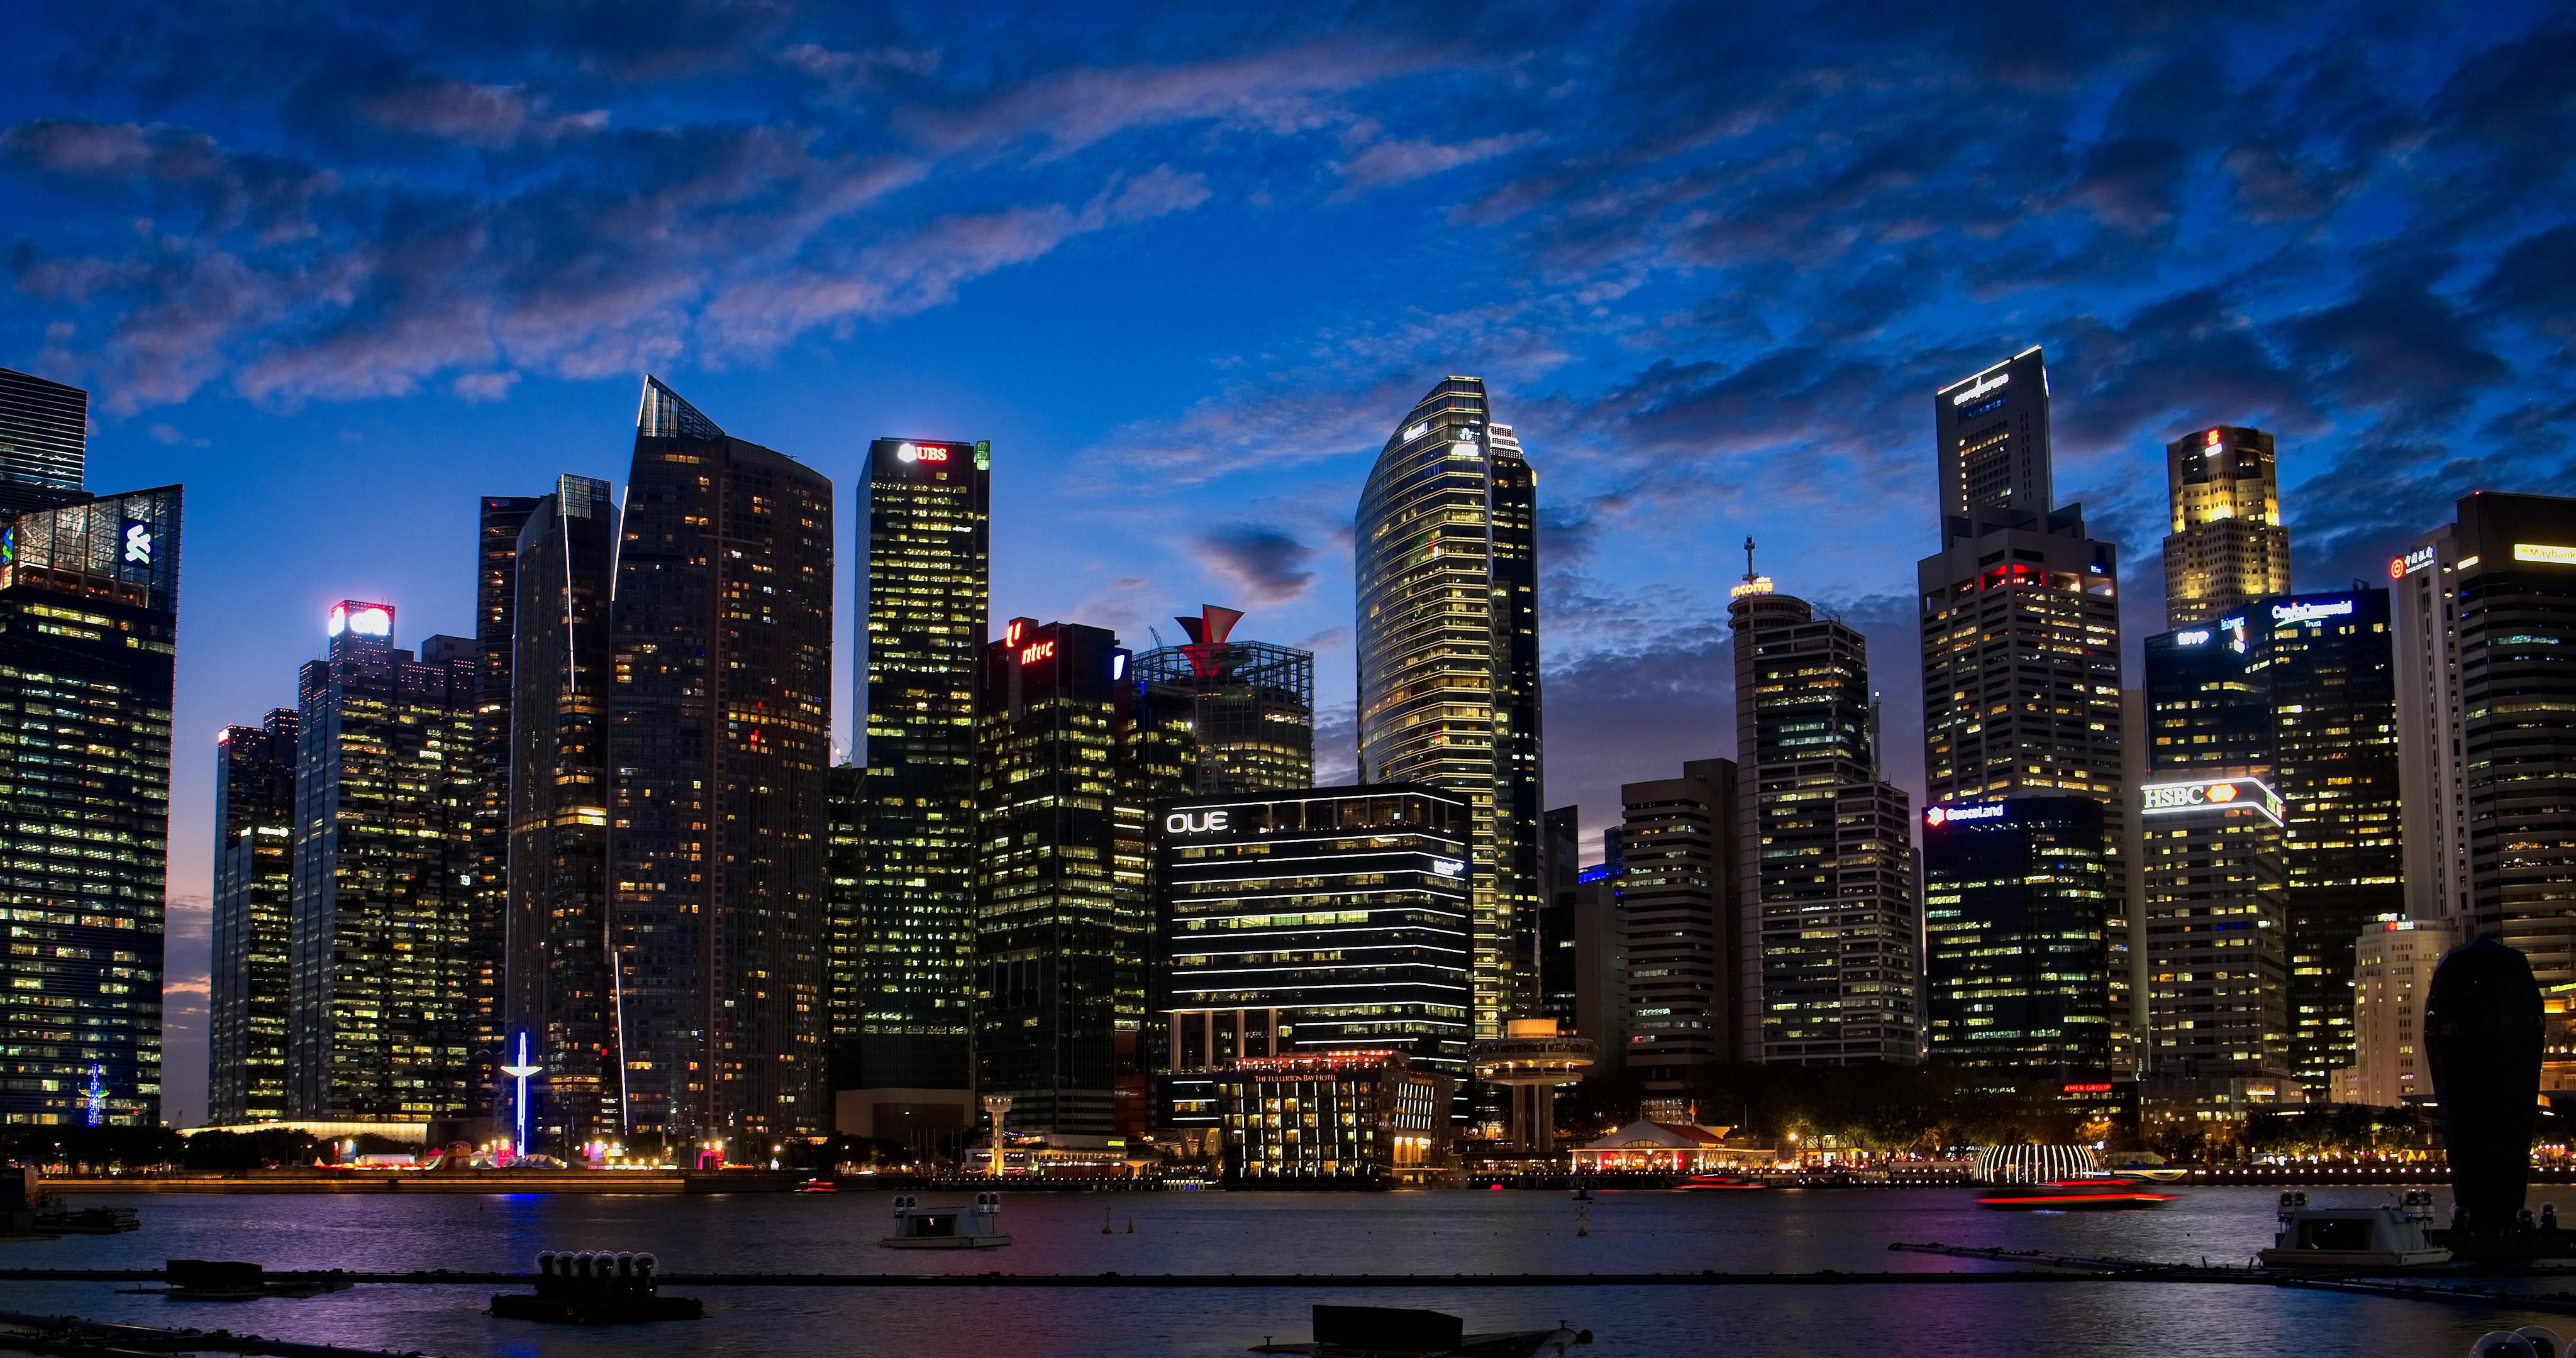 2048x1152 city lights buildings 4k 2048x1152 resolution hd